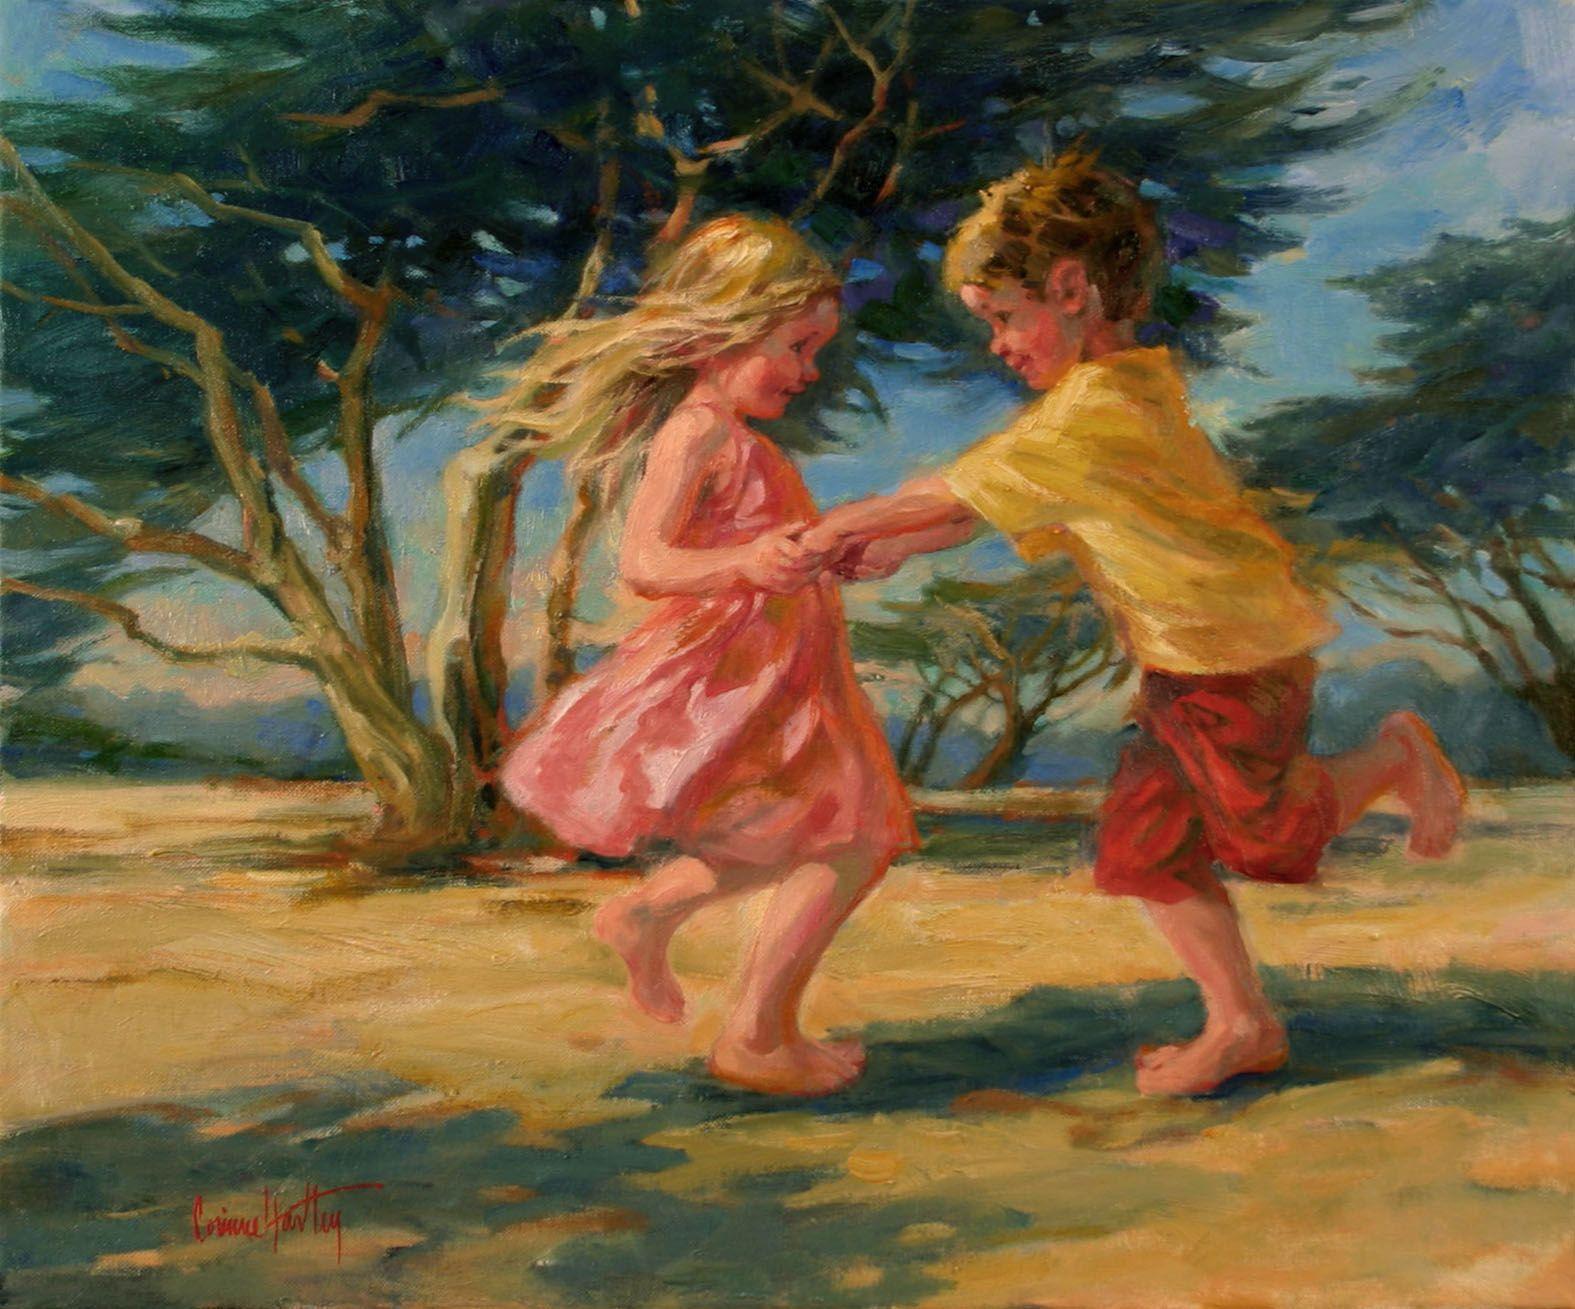 Swining In The Sand Galleries In Carmel California Jones Terwilliger Corinne Hartley Art Painting Art Pictures Dance Paintings